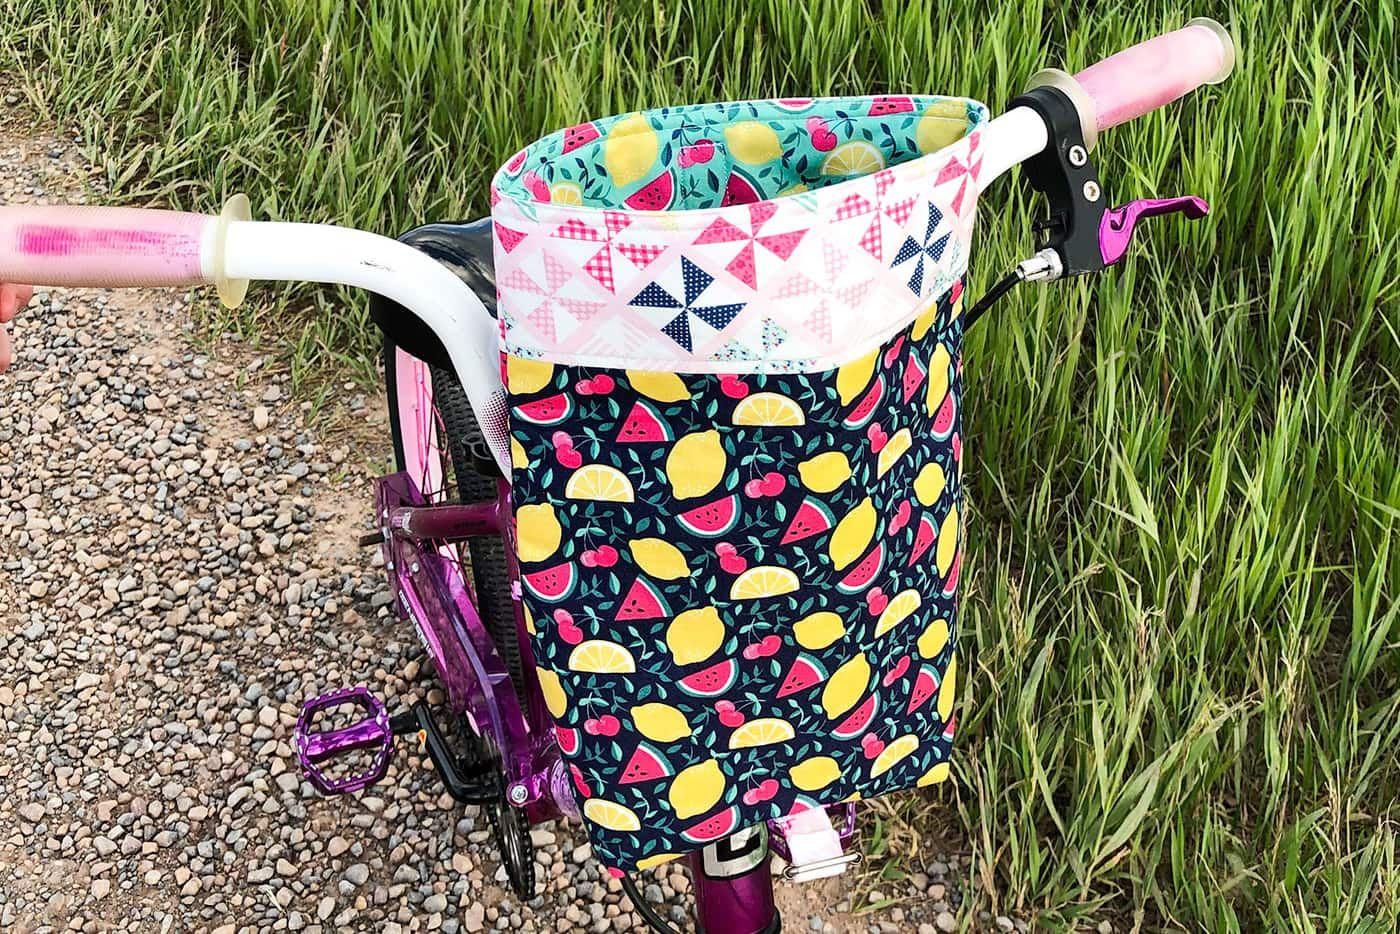 Diy Bike Handlebar Bag Pattern Handlebar Bag Pattern Handlebar Bag Backpack Pattern Sewing